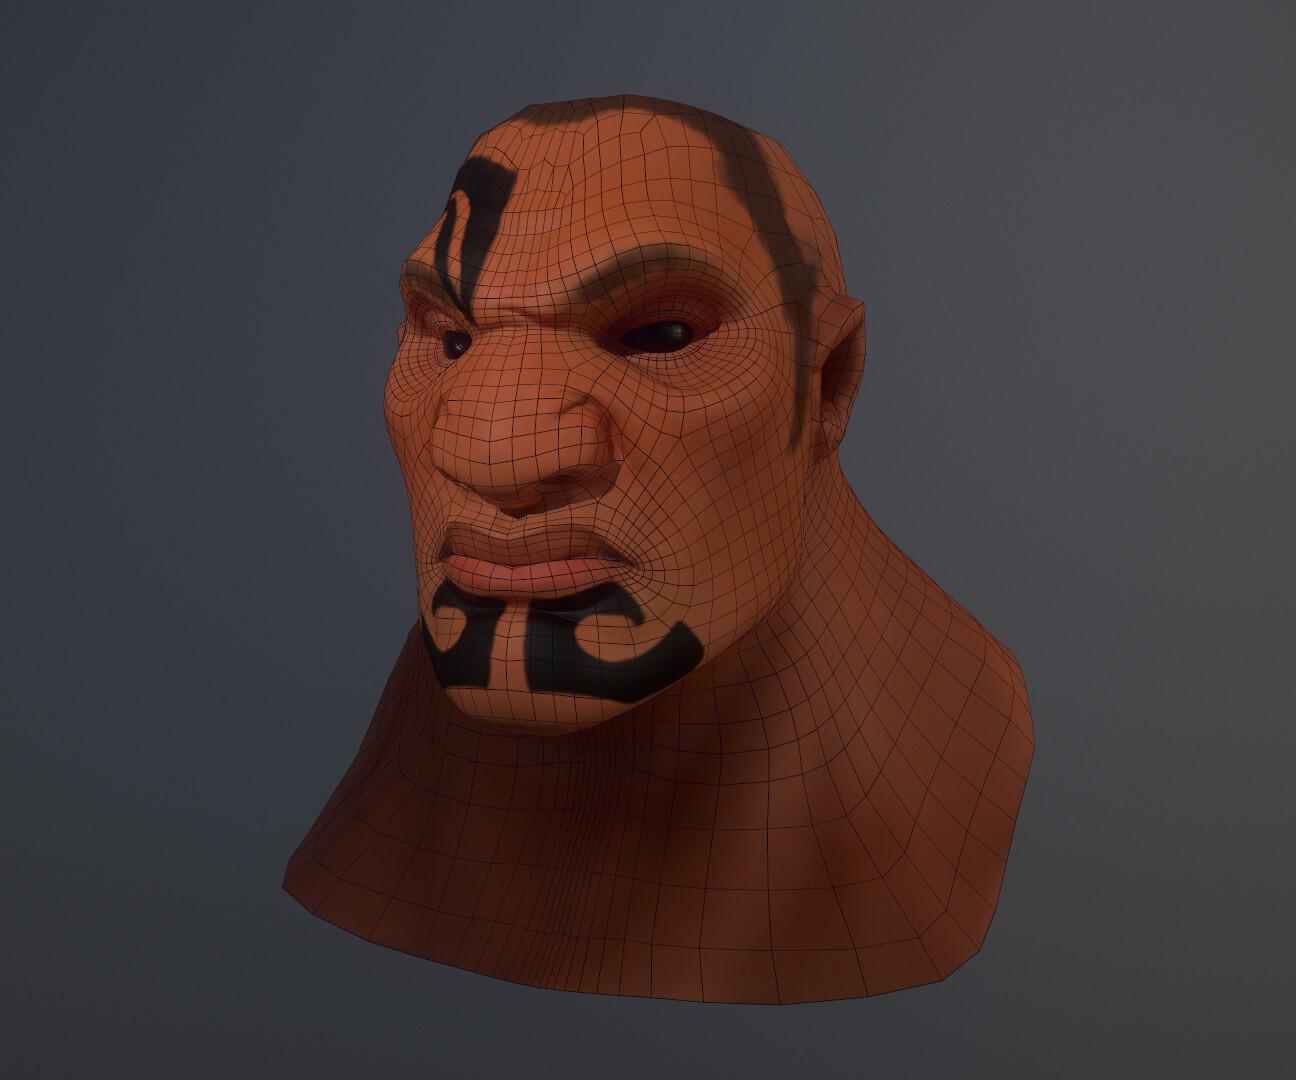 Ty ferrell topology1